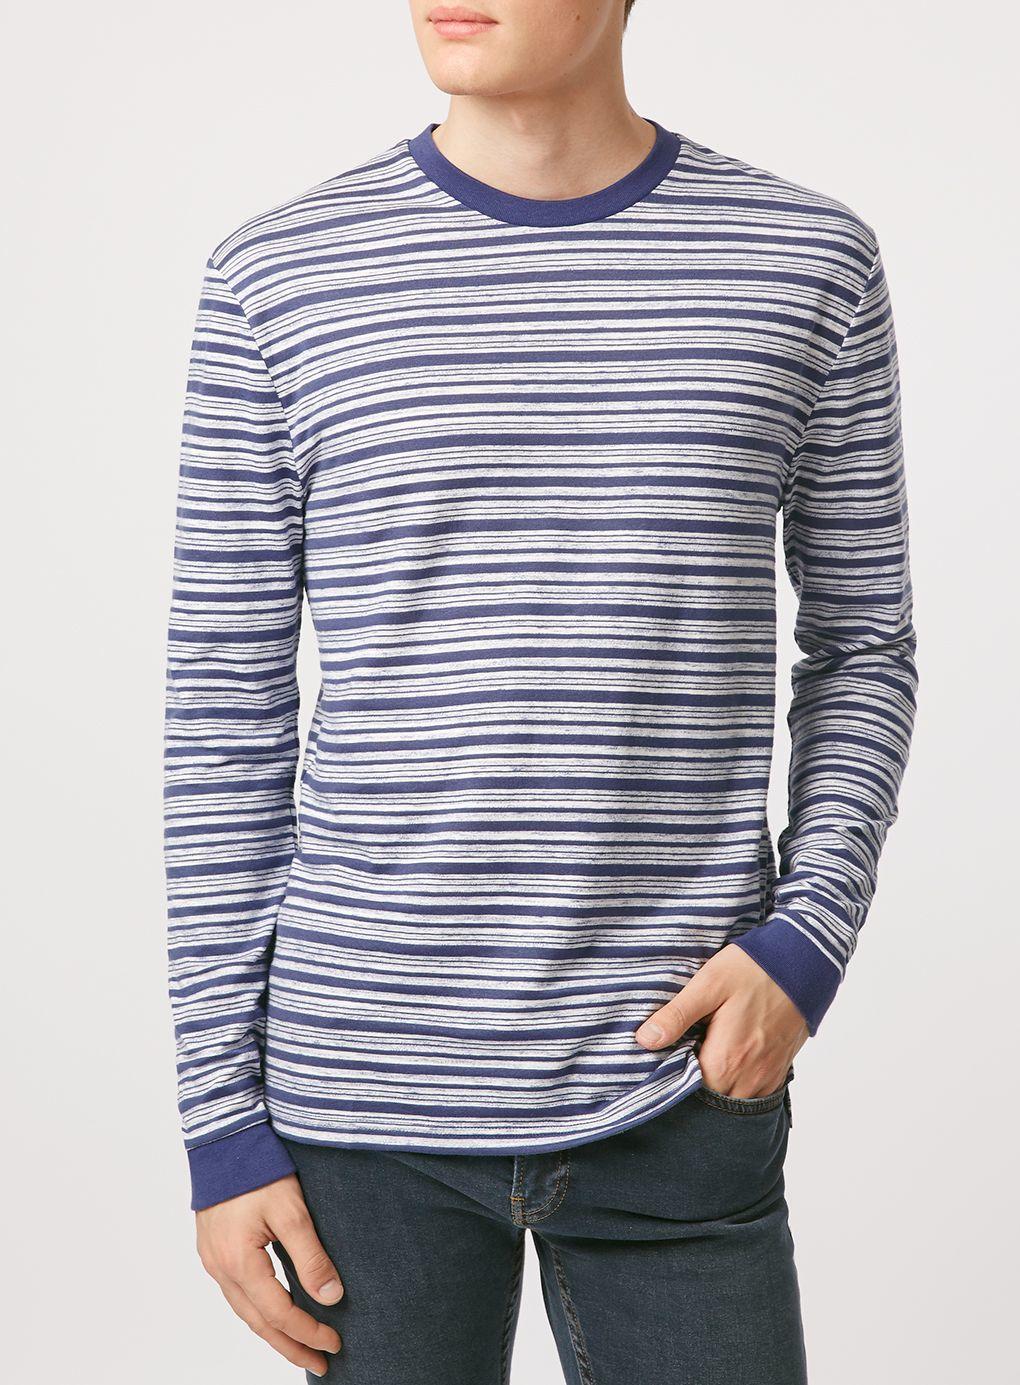 Topman long sleeve stripe crew neck t shirt in blue for for Blue and white striped long sleeve t shirt